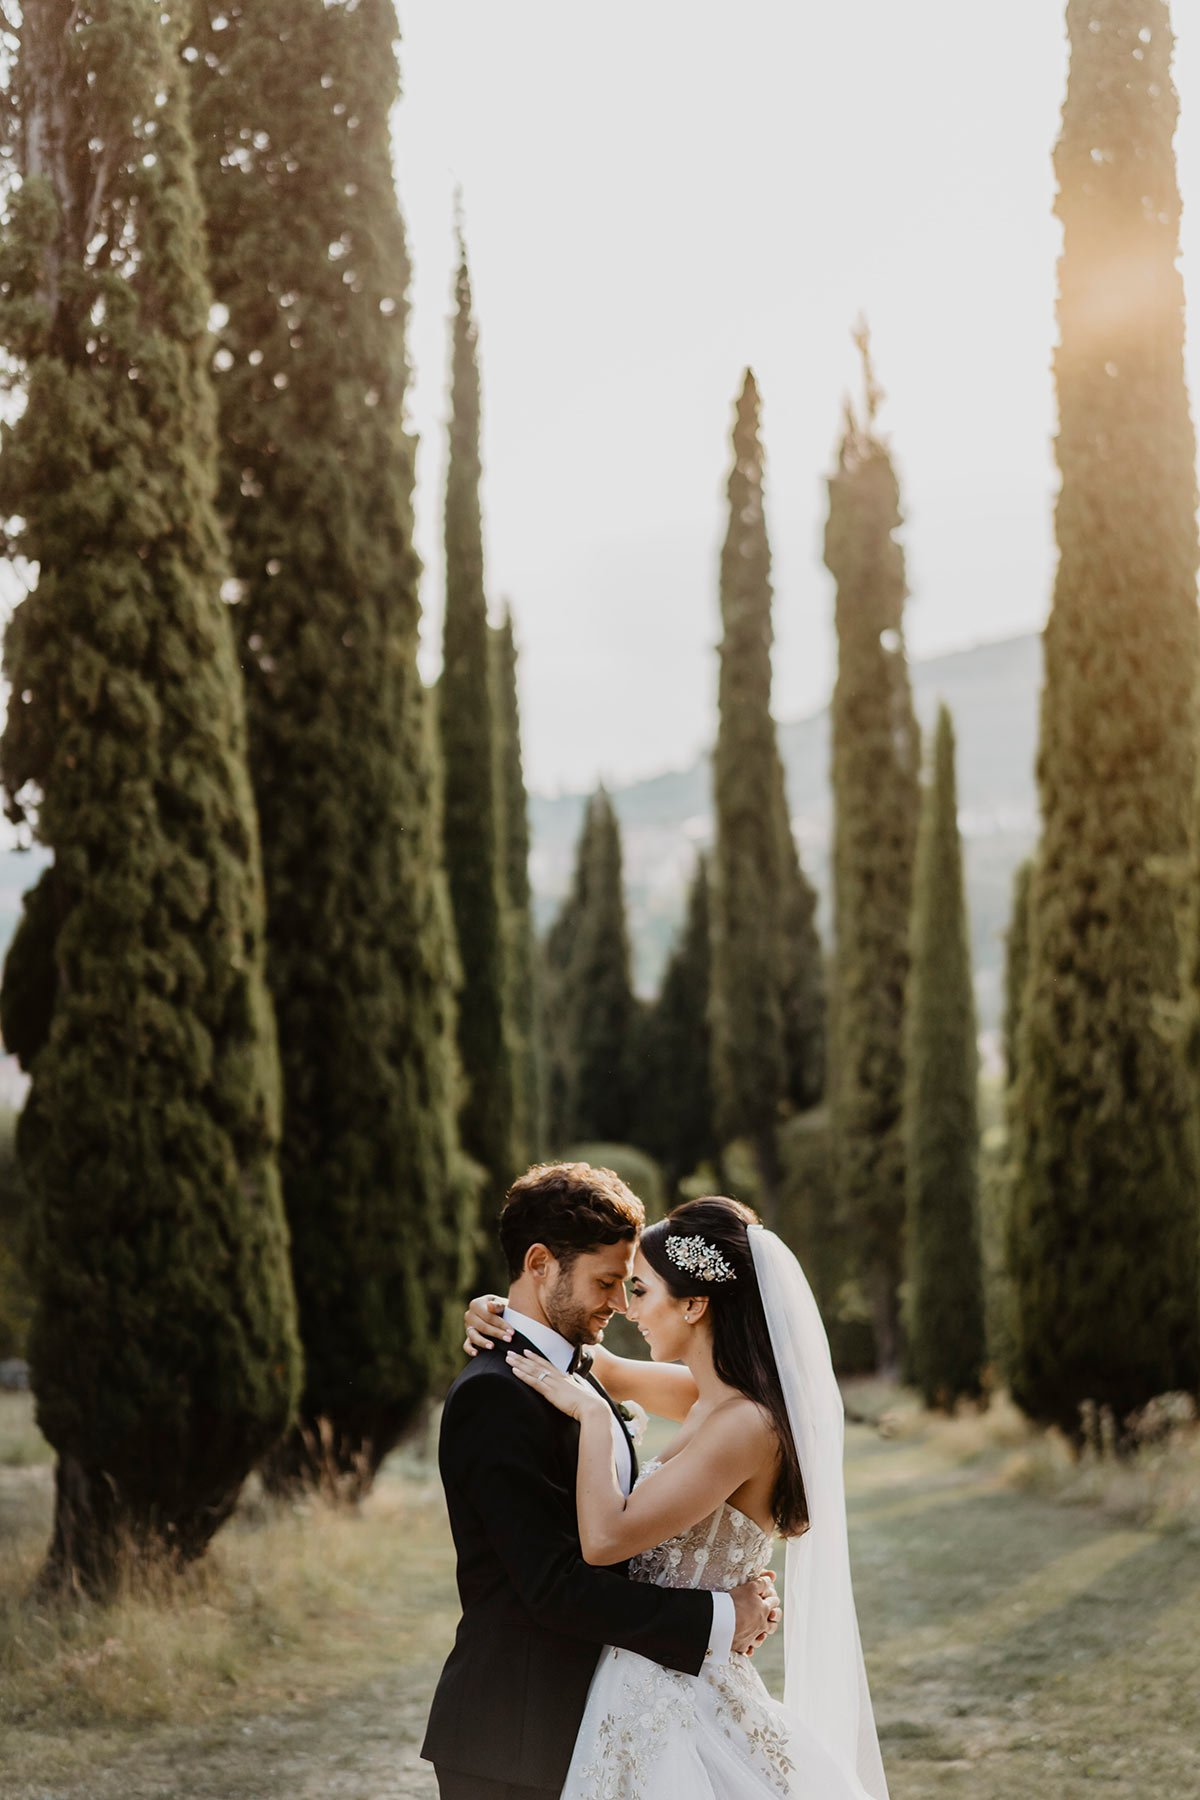 Ranya and Tarek, the bride and the groom